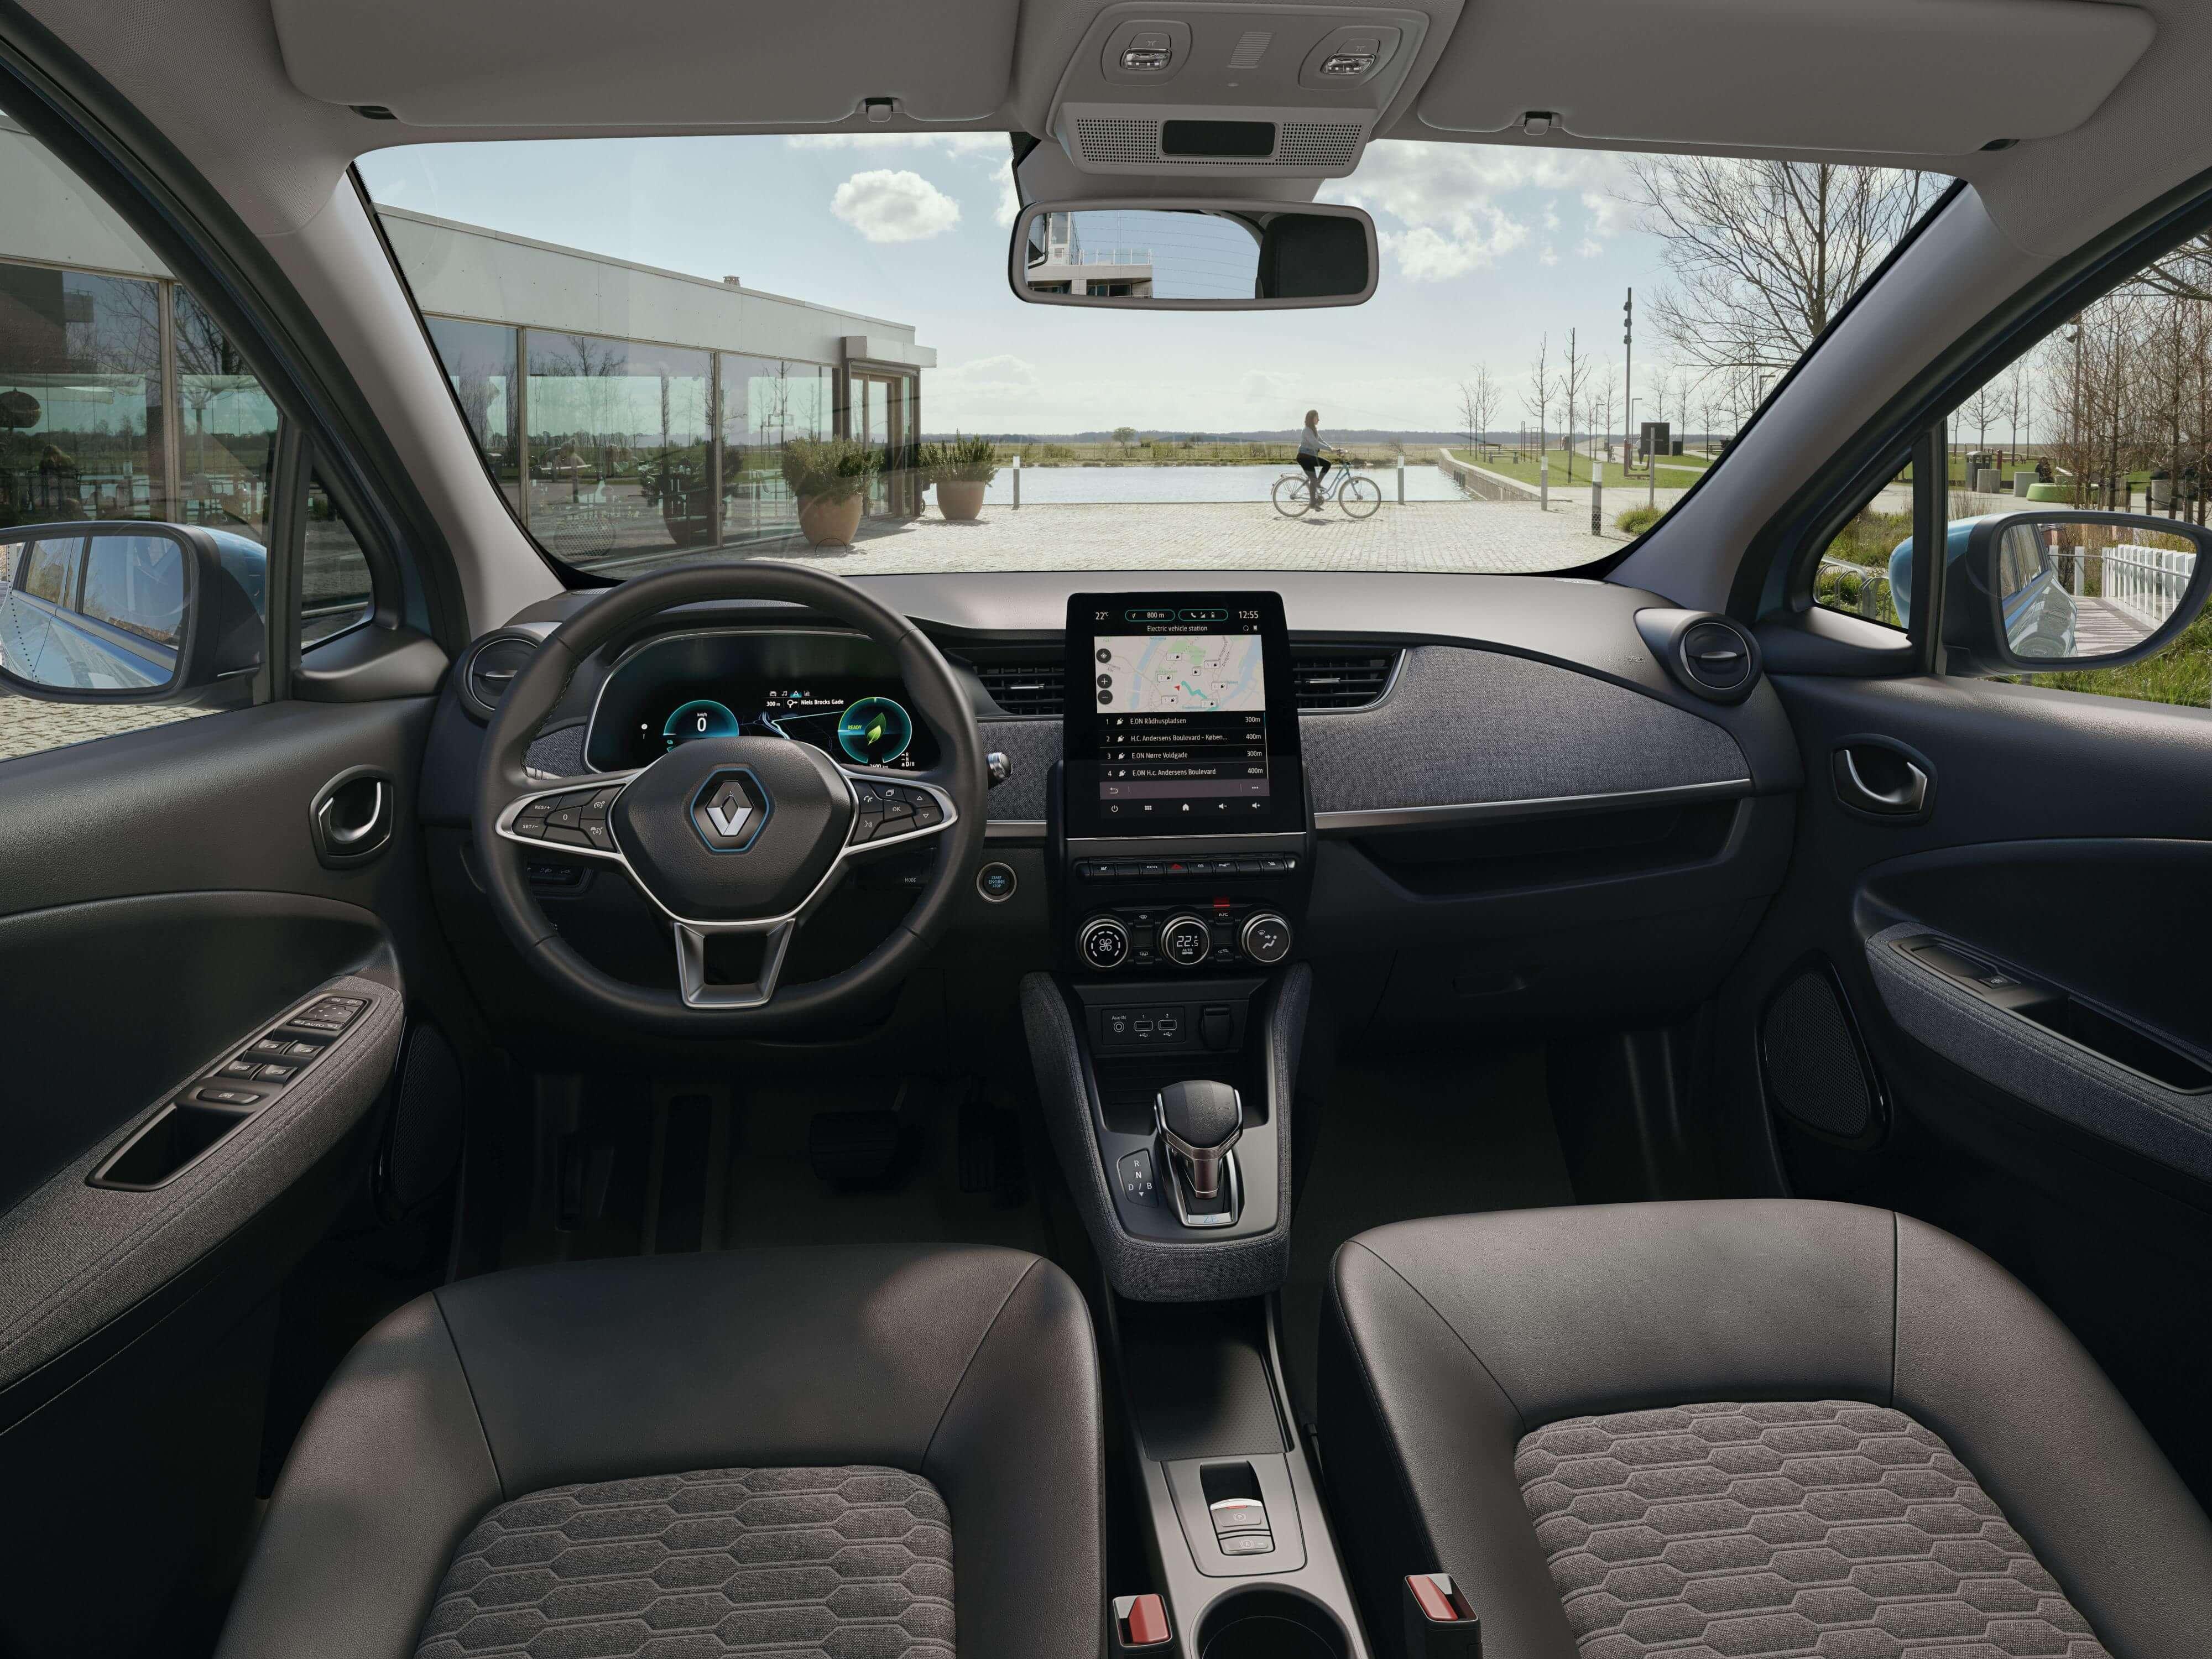 Renault ZOE 2019: interior